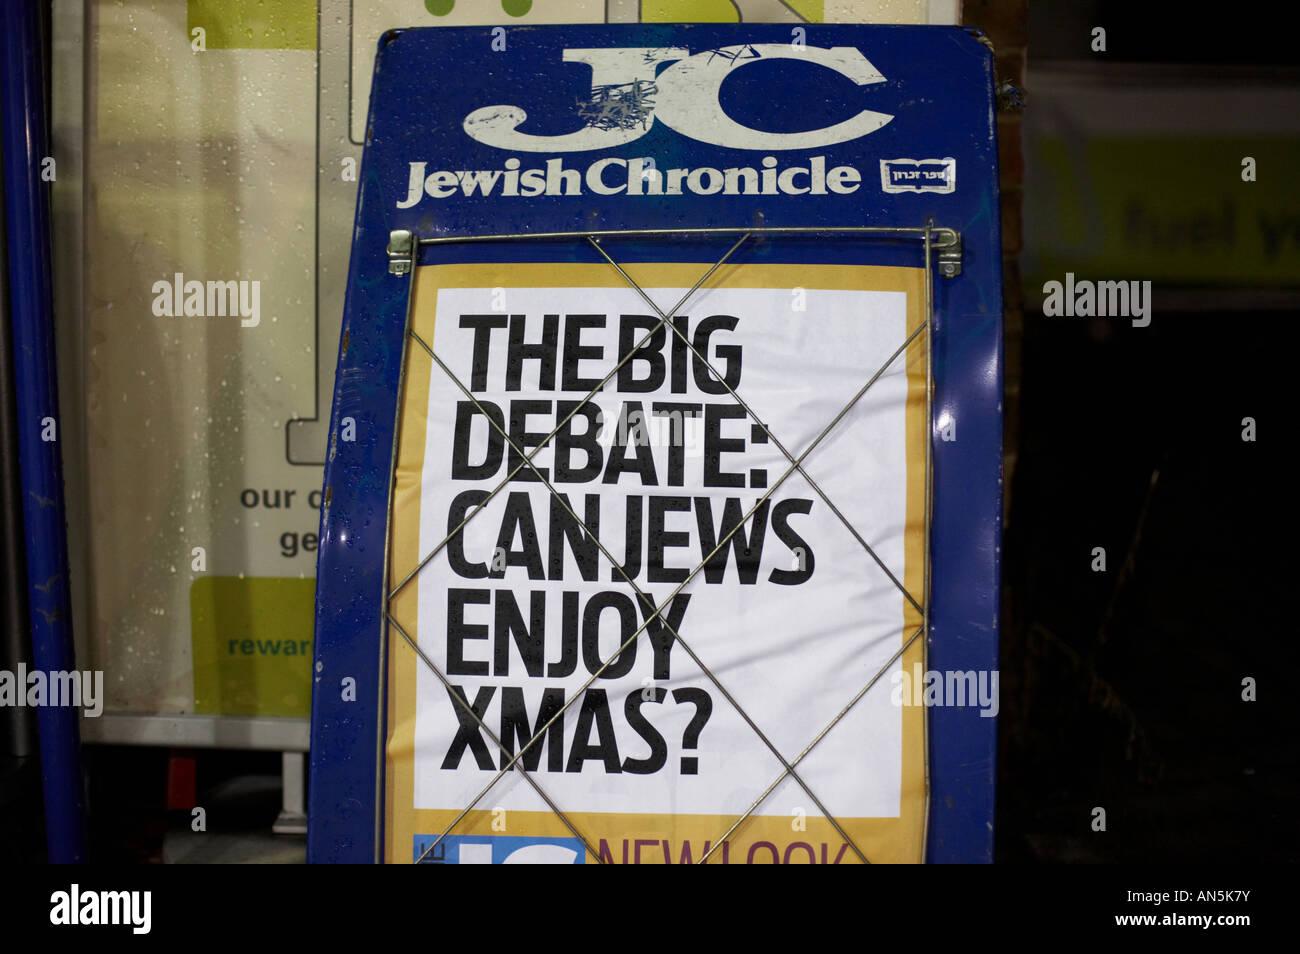 Jewish Chronicle newspaper headline board - Stock Image